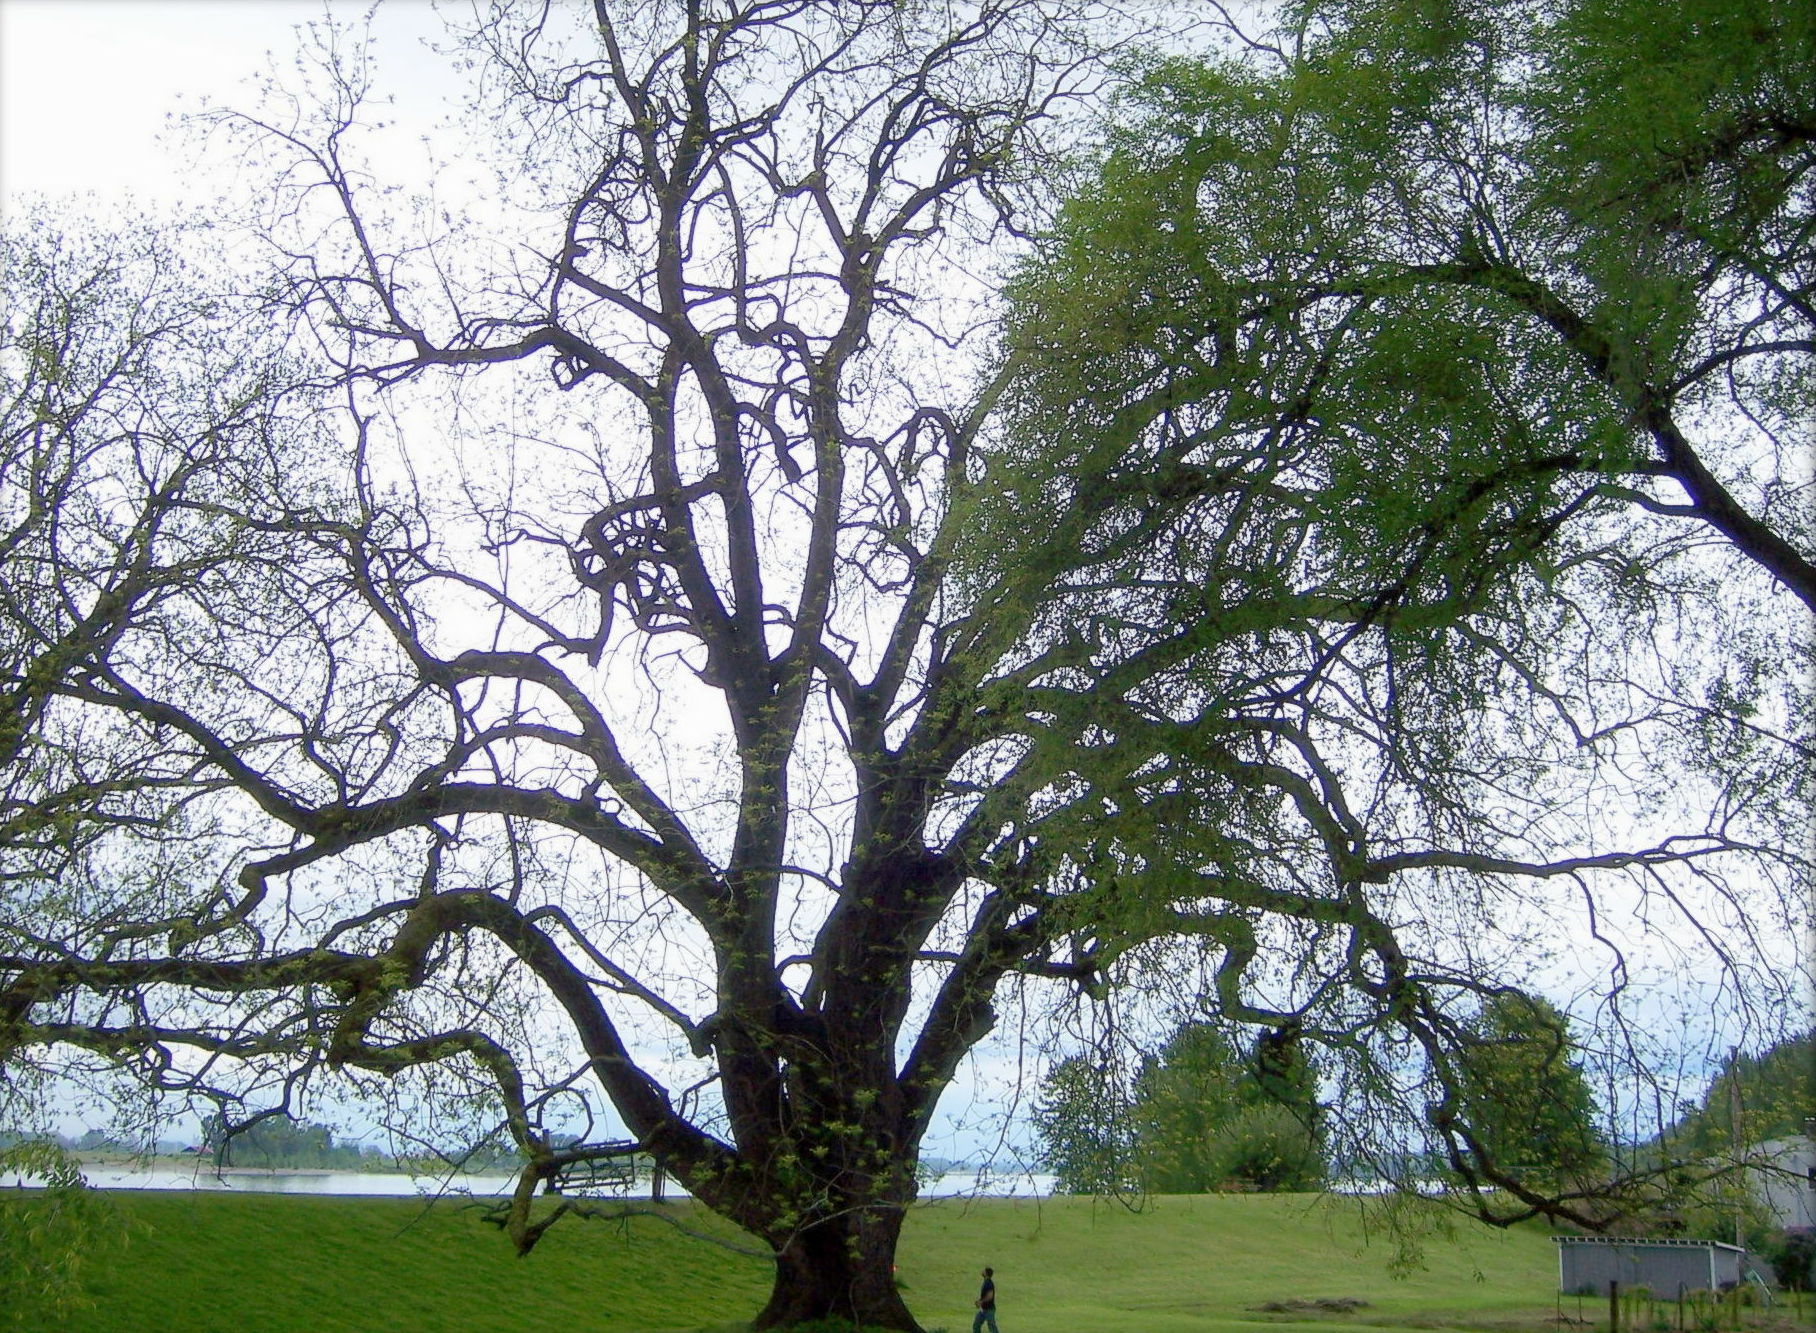 025 Description Of Trees For Essays Black Walnut Trees2 Roots Evil Ascending The Giants Wikimedia Commons Essay Striking Full